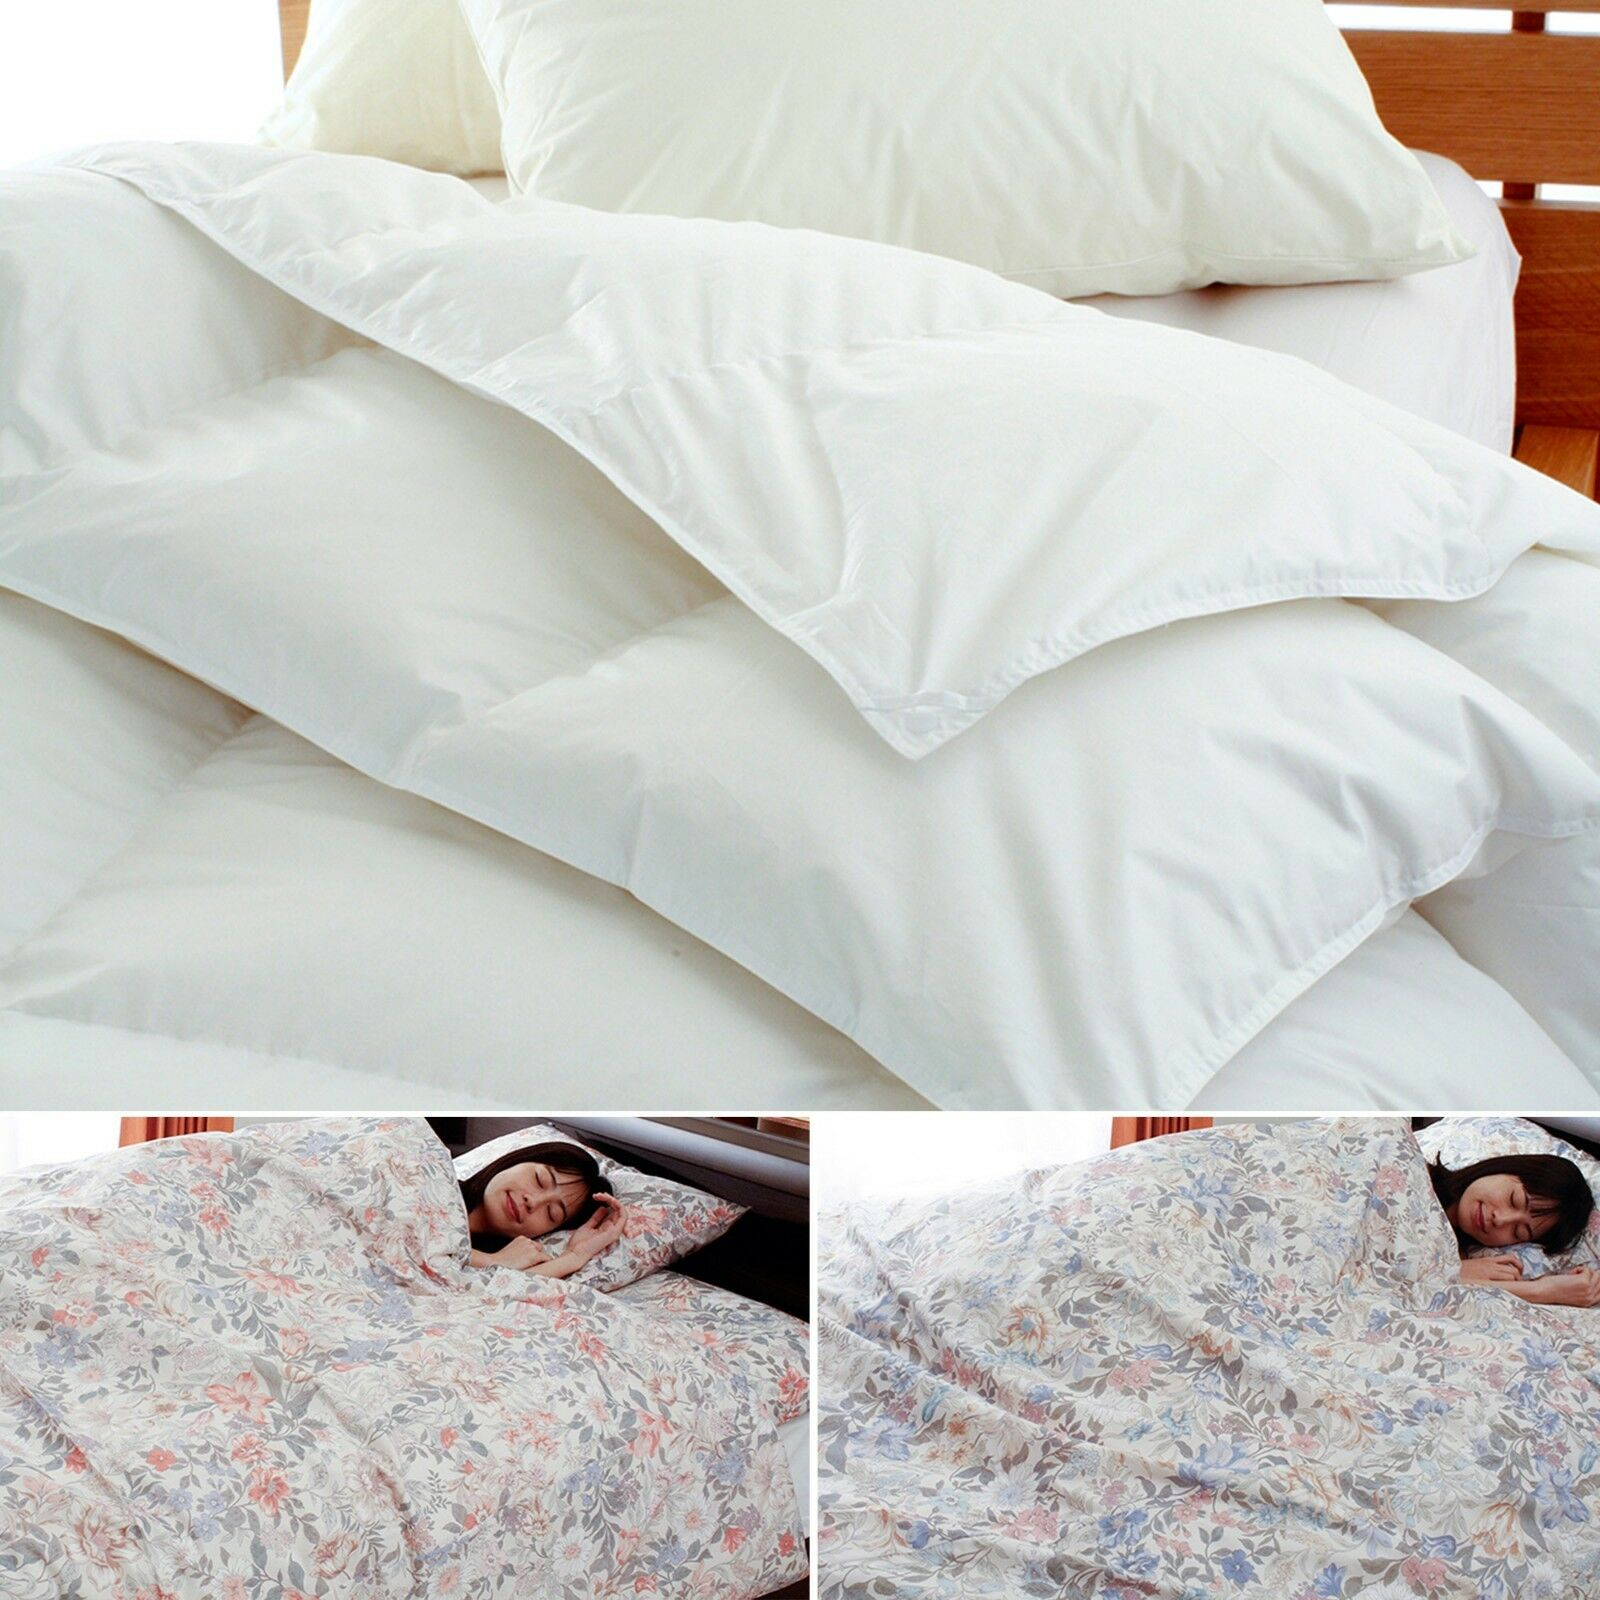 Japan,2 piece down-filled comforter,duvet  DUVET BASIC , with RUNE floral cover